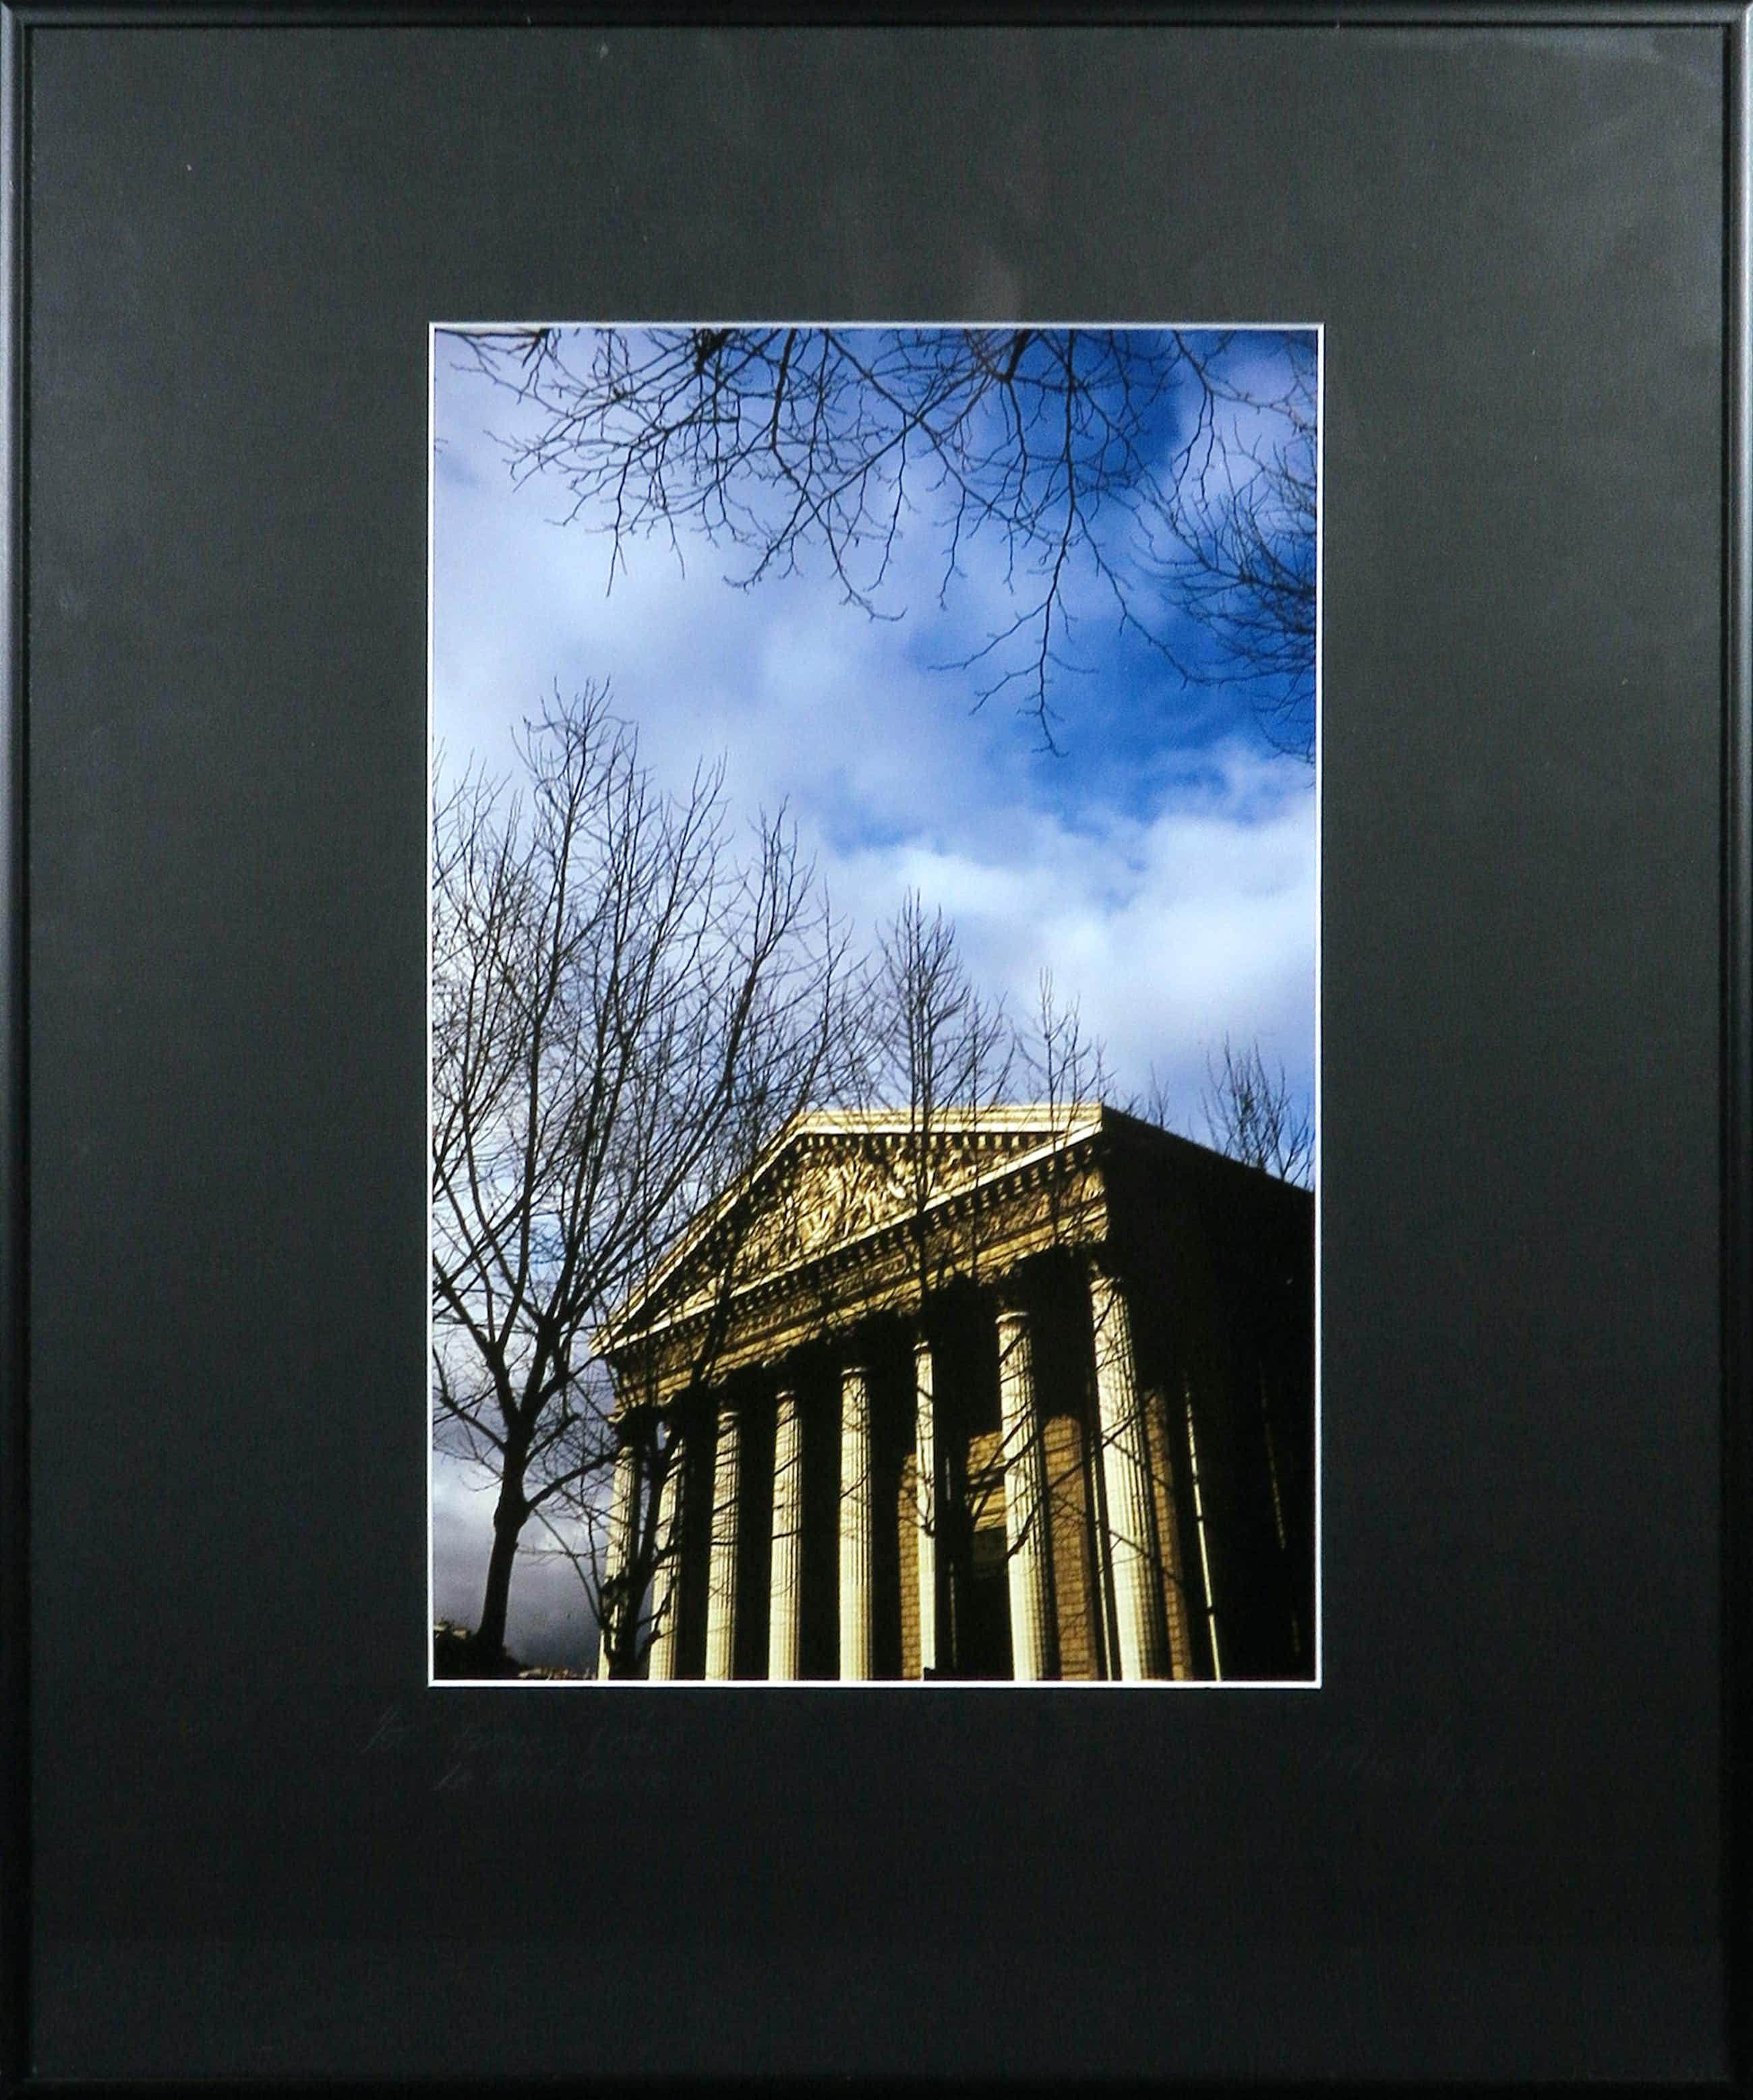 Paul Huf - Foto, France, Paris, La Madeleine - Ingelijst kopen? Bied vanaf 35!